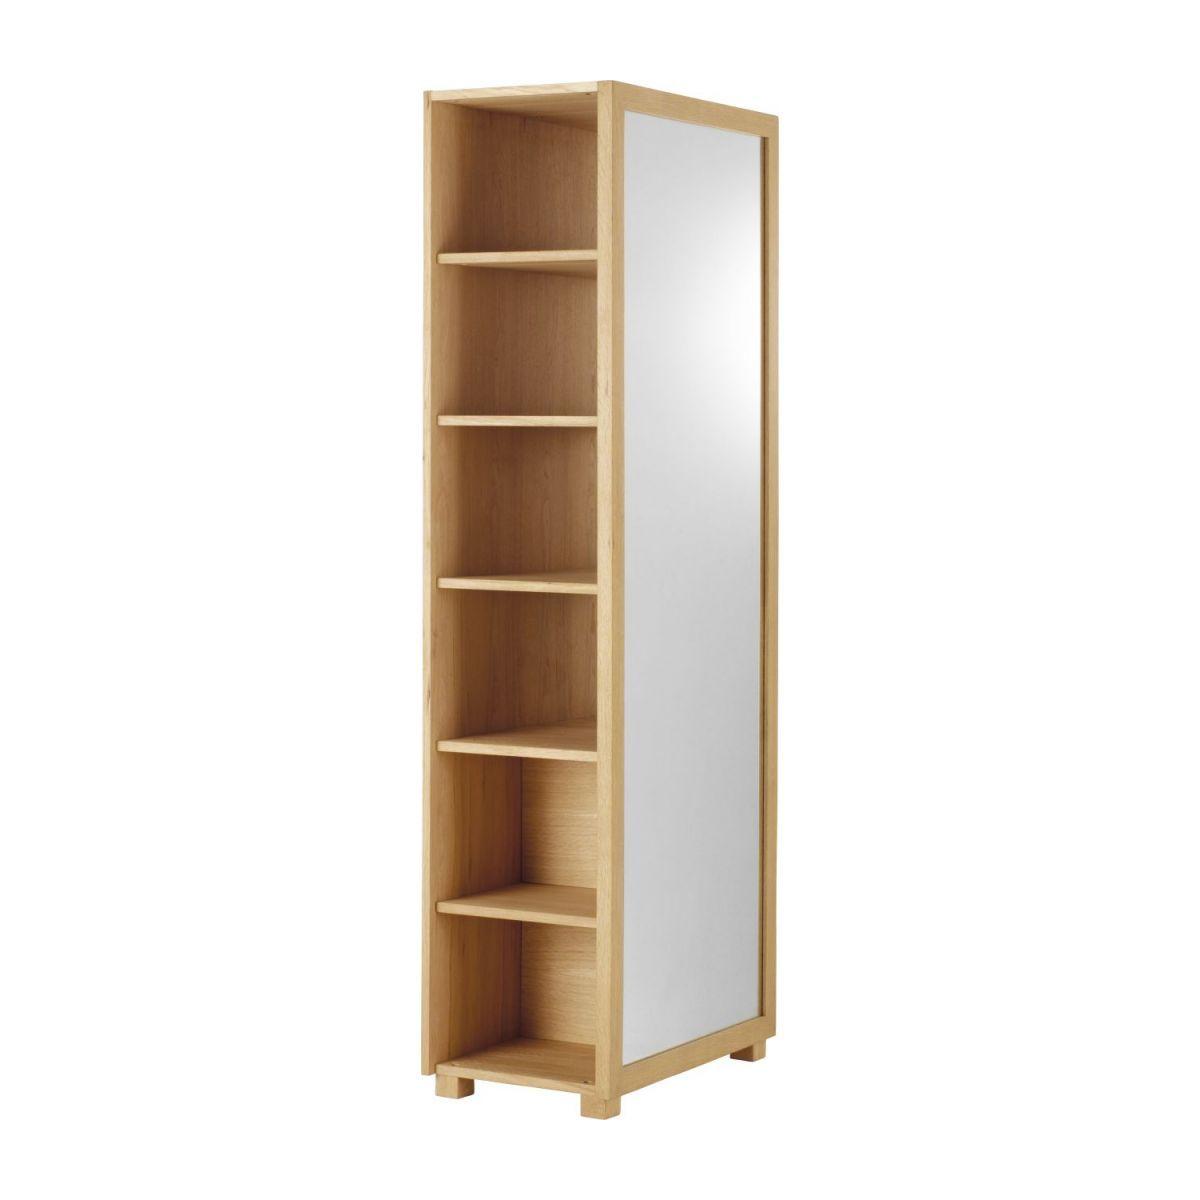 Hana Ii Miroir Sur Pied En Chene Avec Rangements En 2020 Miroir Sur Pied Mobilier De Salon Miroir Habitat